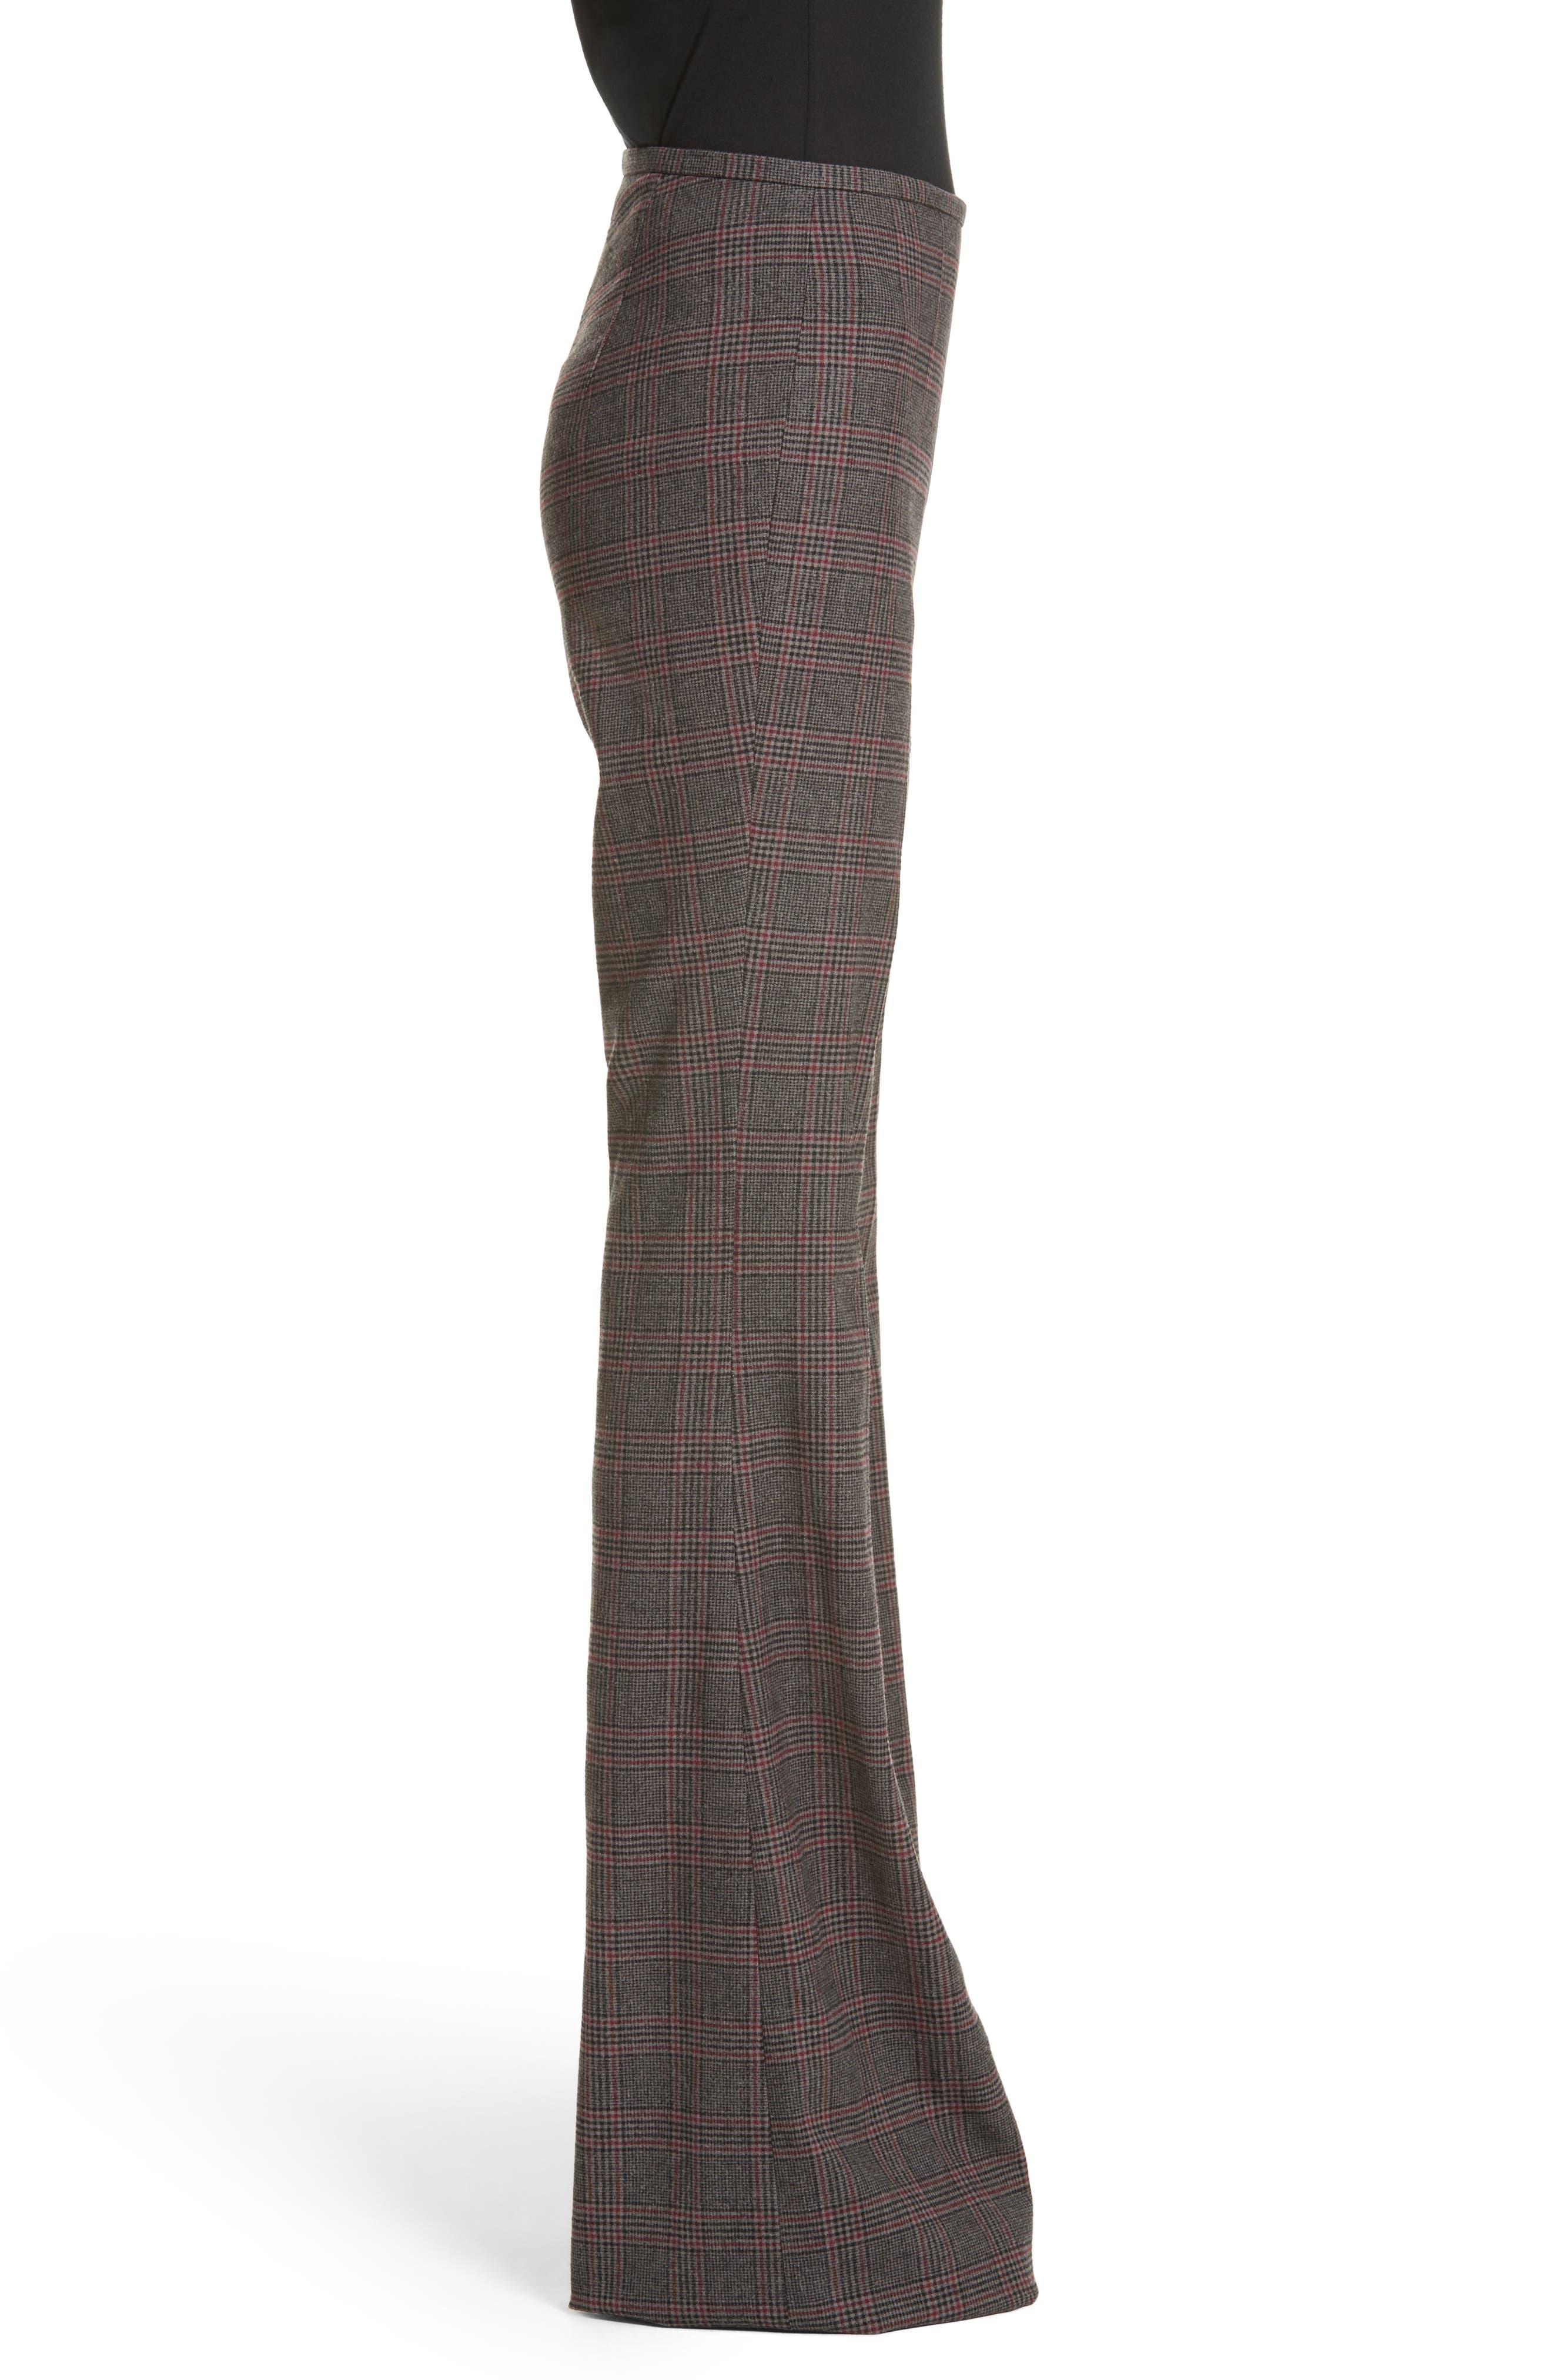 MICHAEL KORS,                             Plaid Stretch Wool Flannel Pants,                             Alternate thumbnail 3, color,                             034